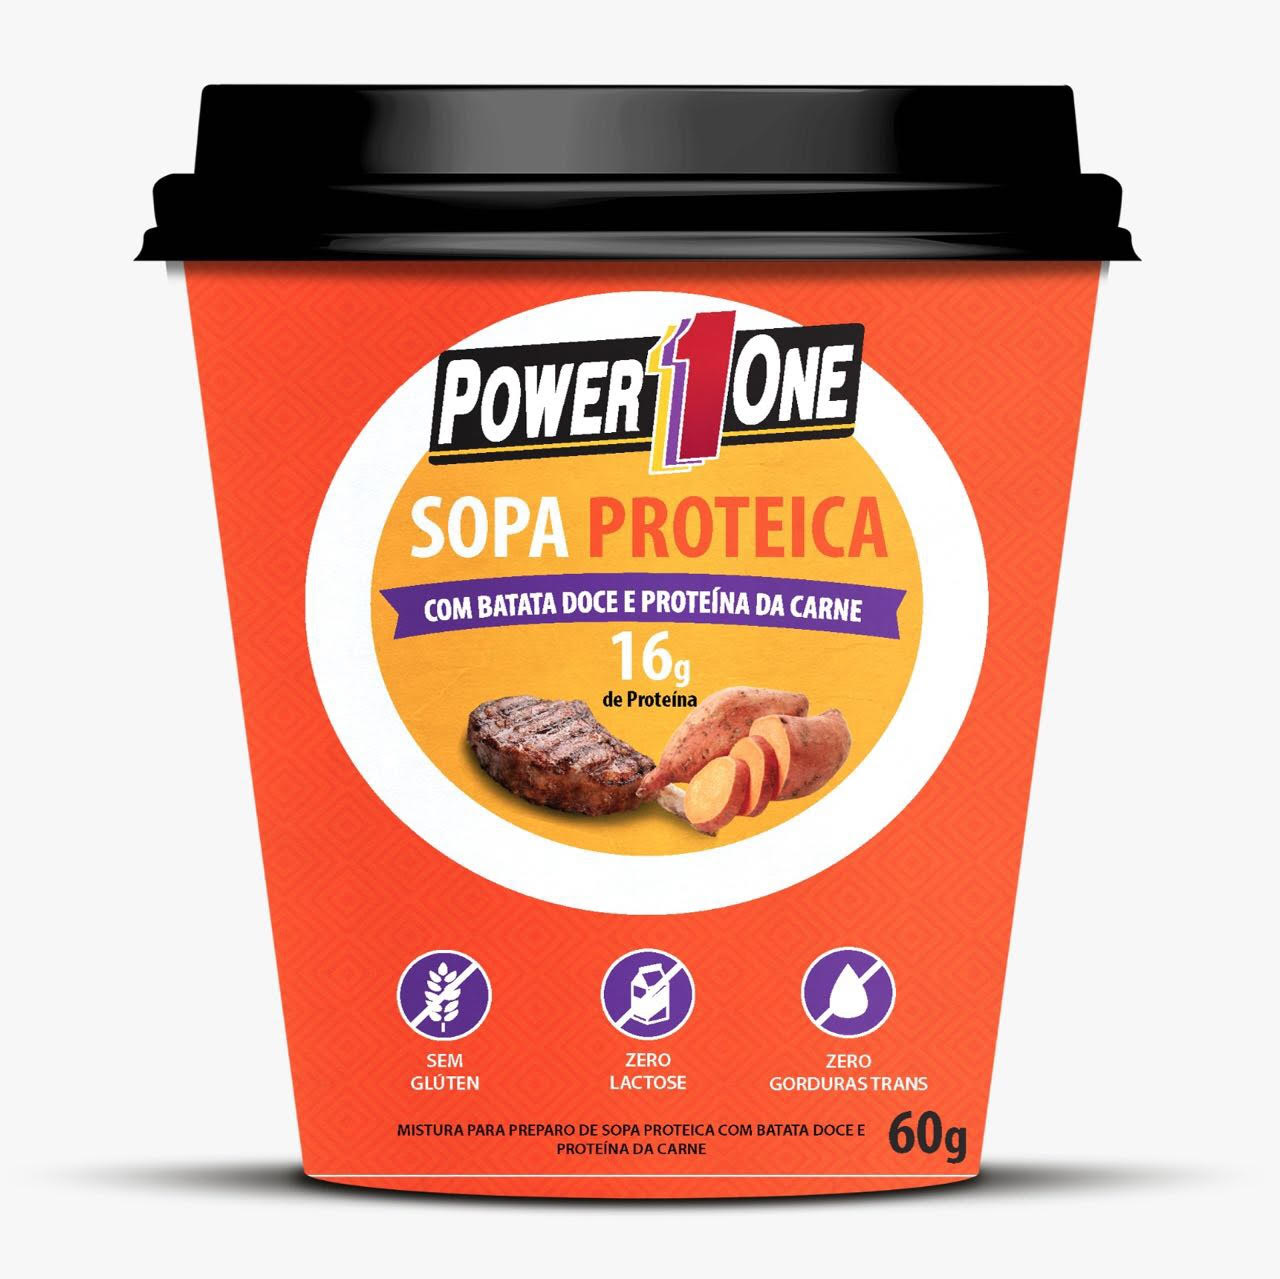 Embalagem sopa proteica Power1One